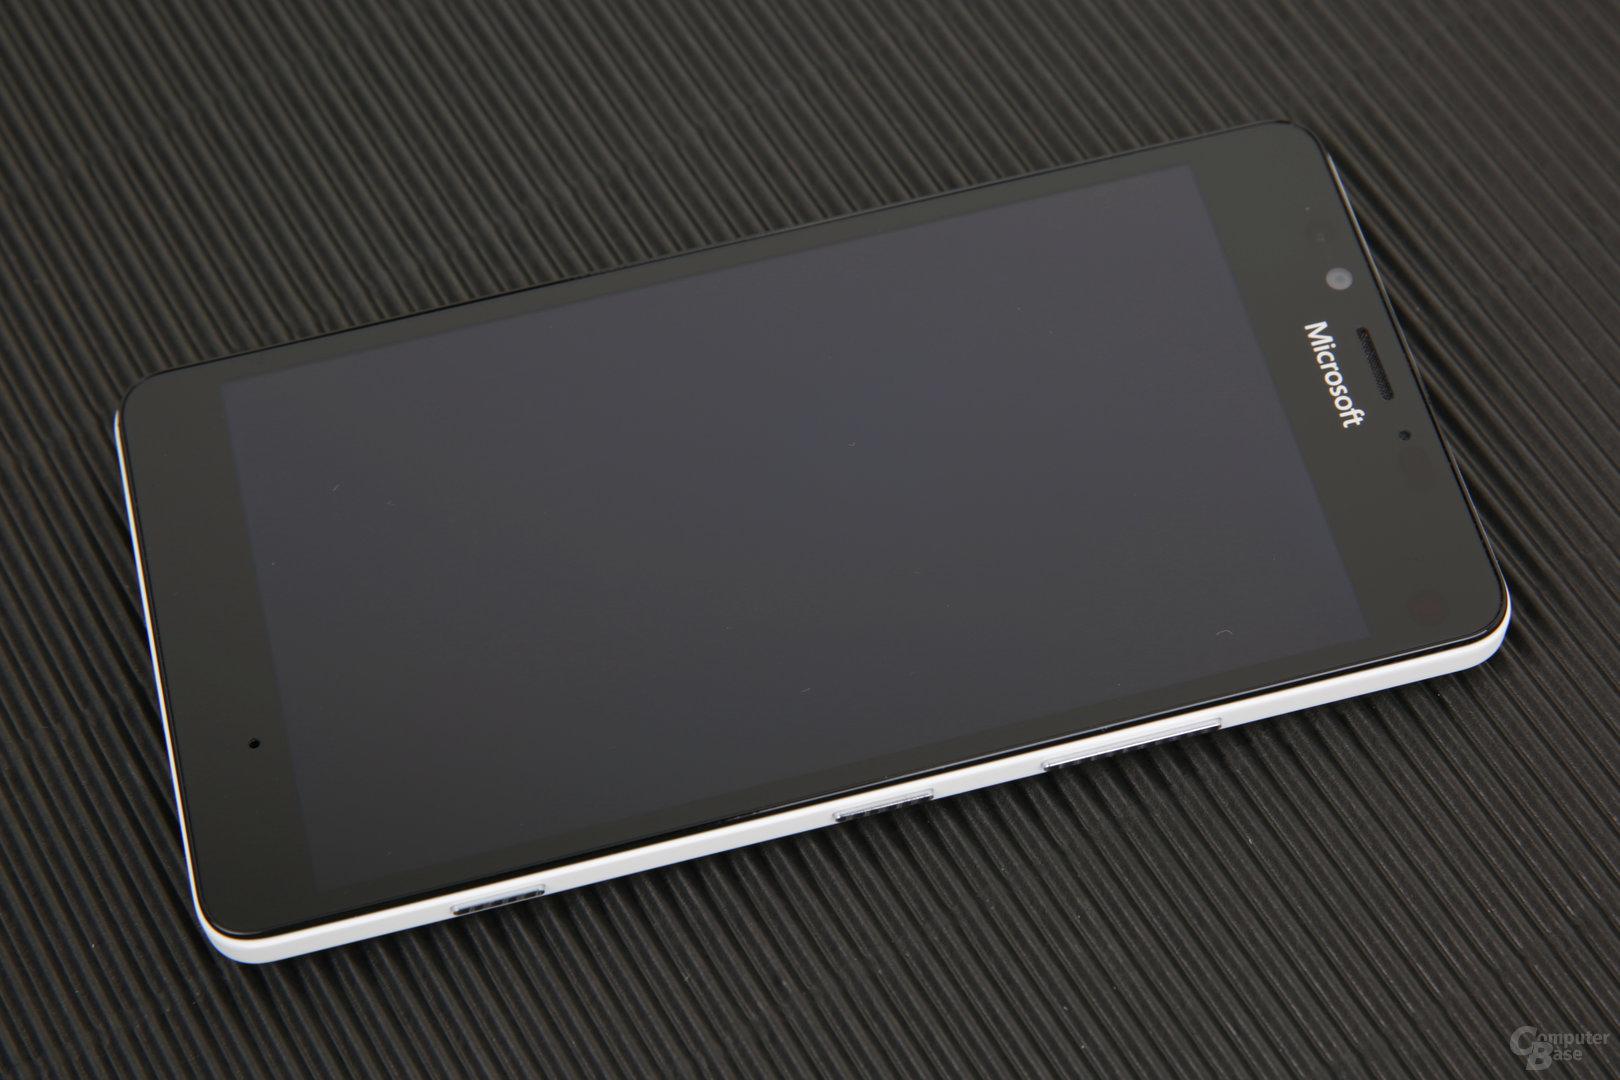 5,2 Zoll großes QHD-OLED-Display